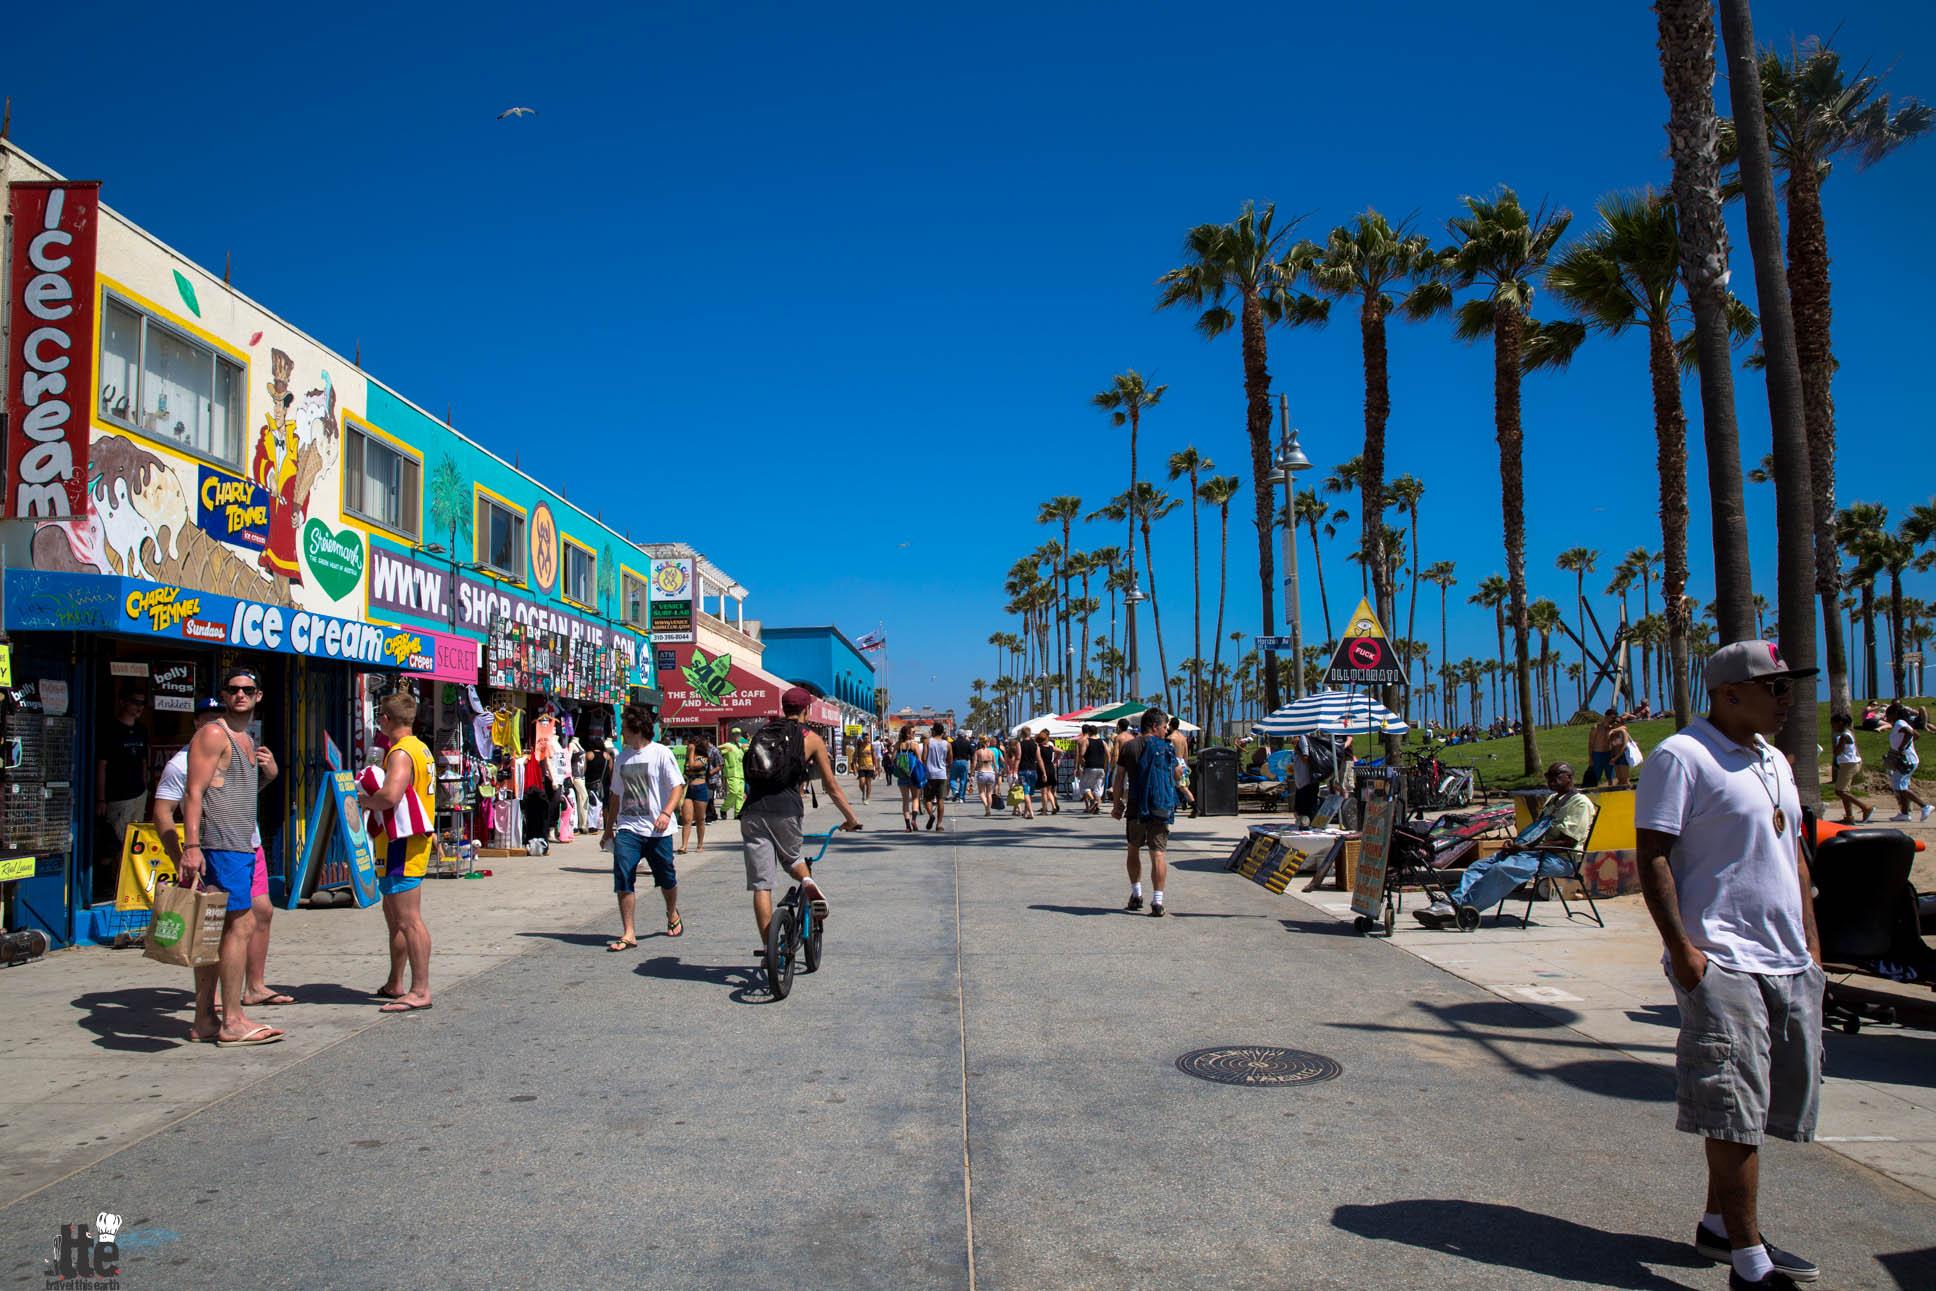 Venice Beach Boardwalk (photo courtesy of travelthisearth.com)